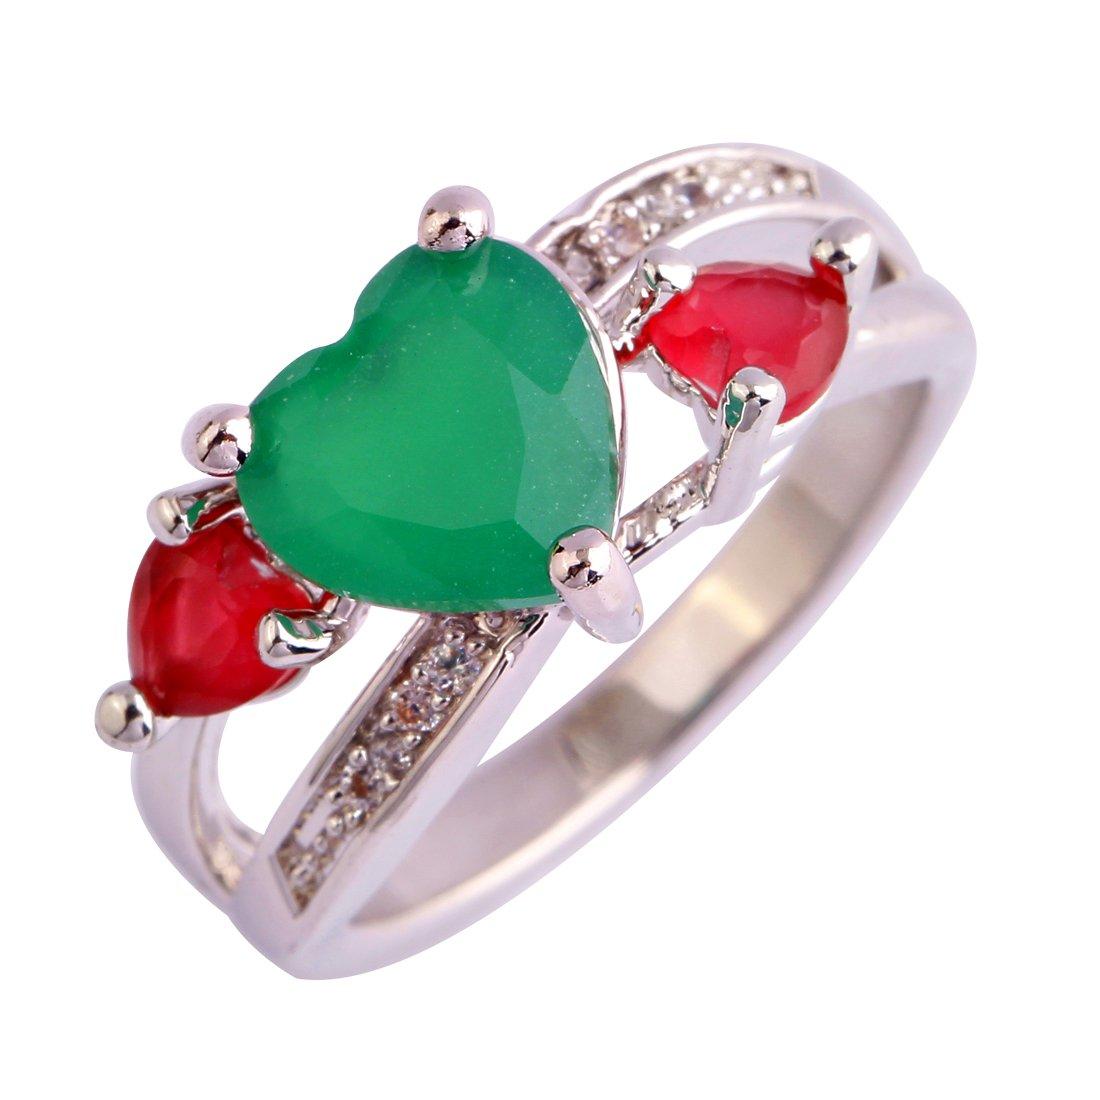 PSEZY Mystic Rainbow Topaz Amethyst rings for Women Vintage Engagement Rings Promise Rings MAE495-B495 10.0